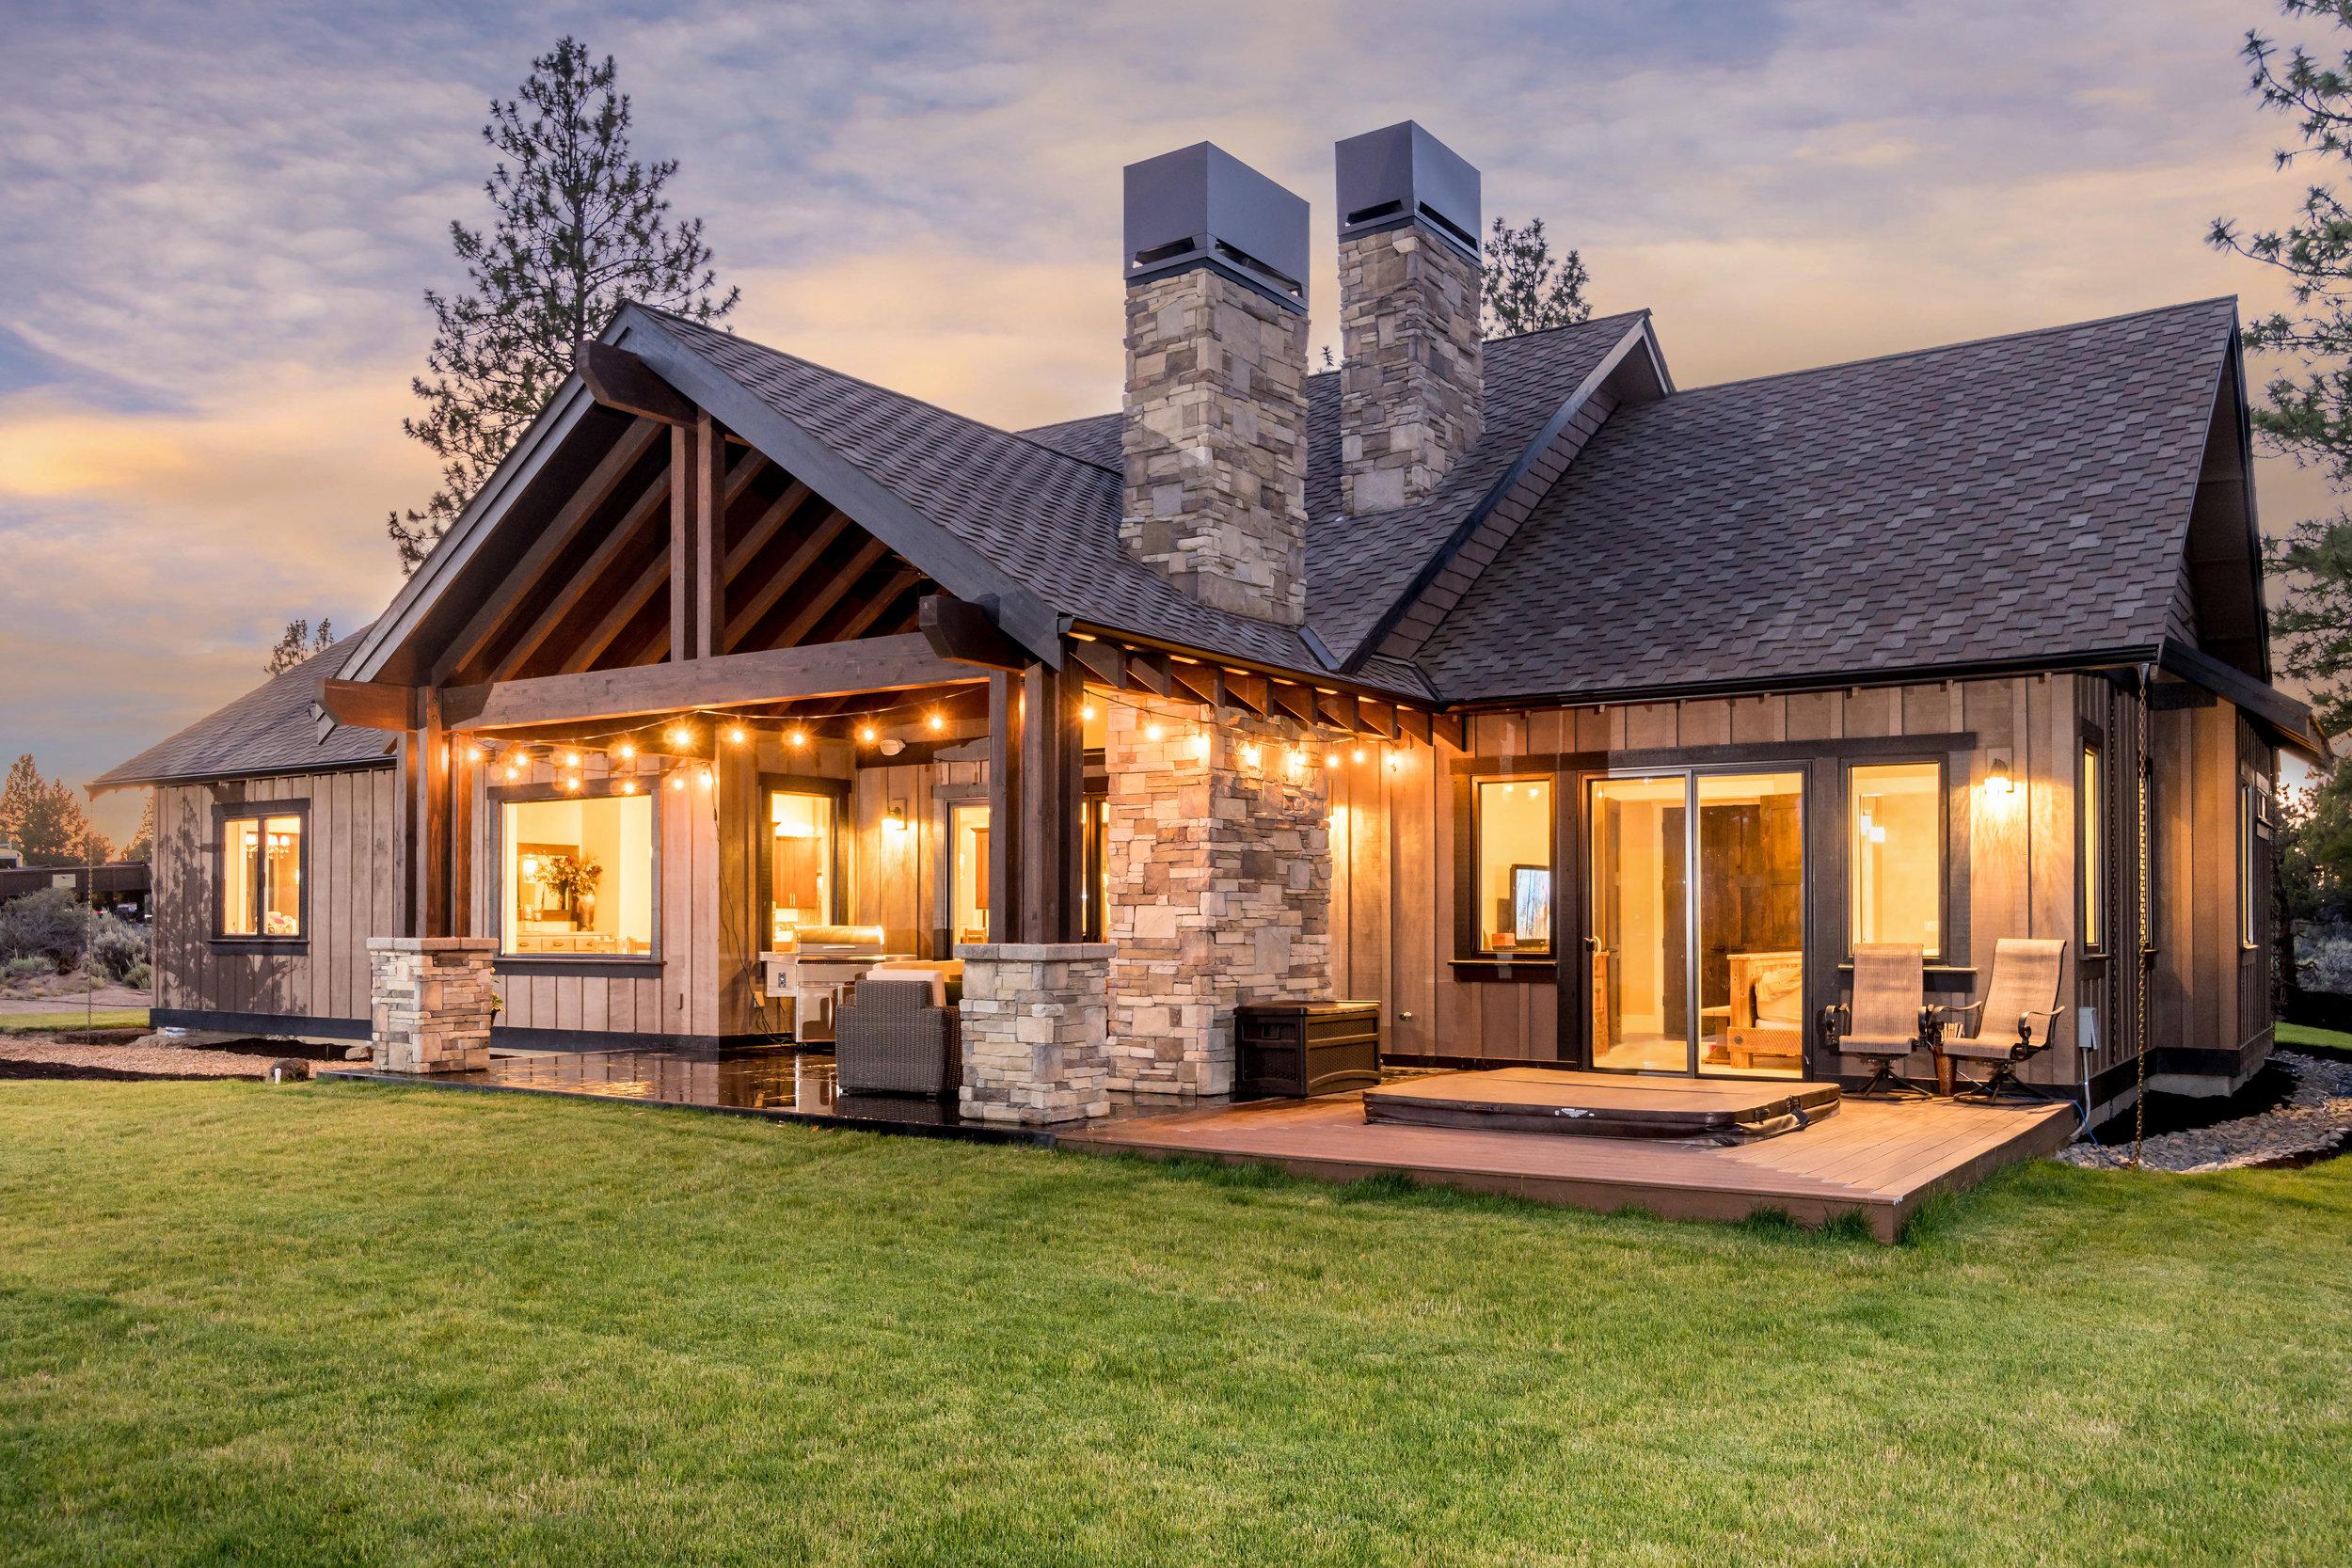 Bend-Oregon-Custom-Home-Remodel-Builder-Construction-House-Vacation-Home.jpg